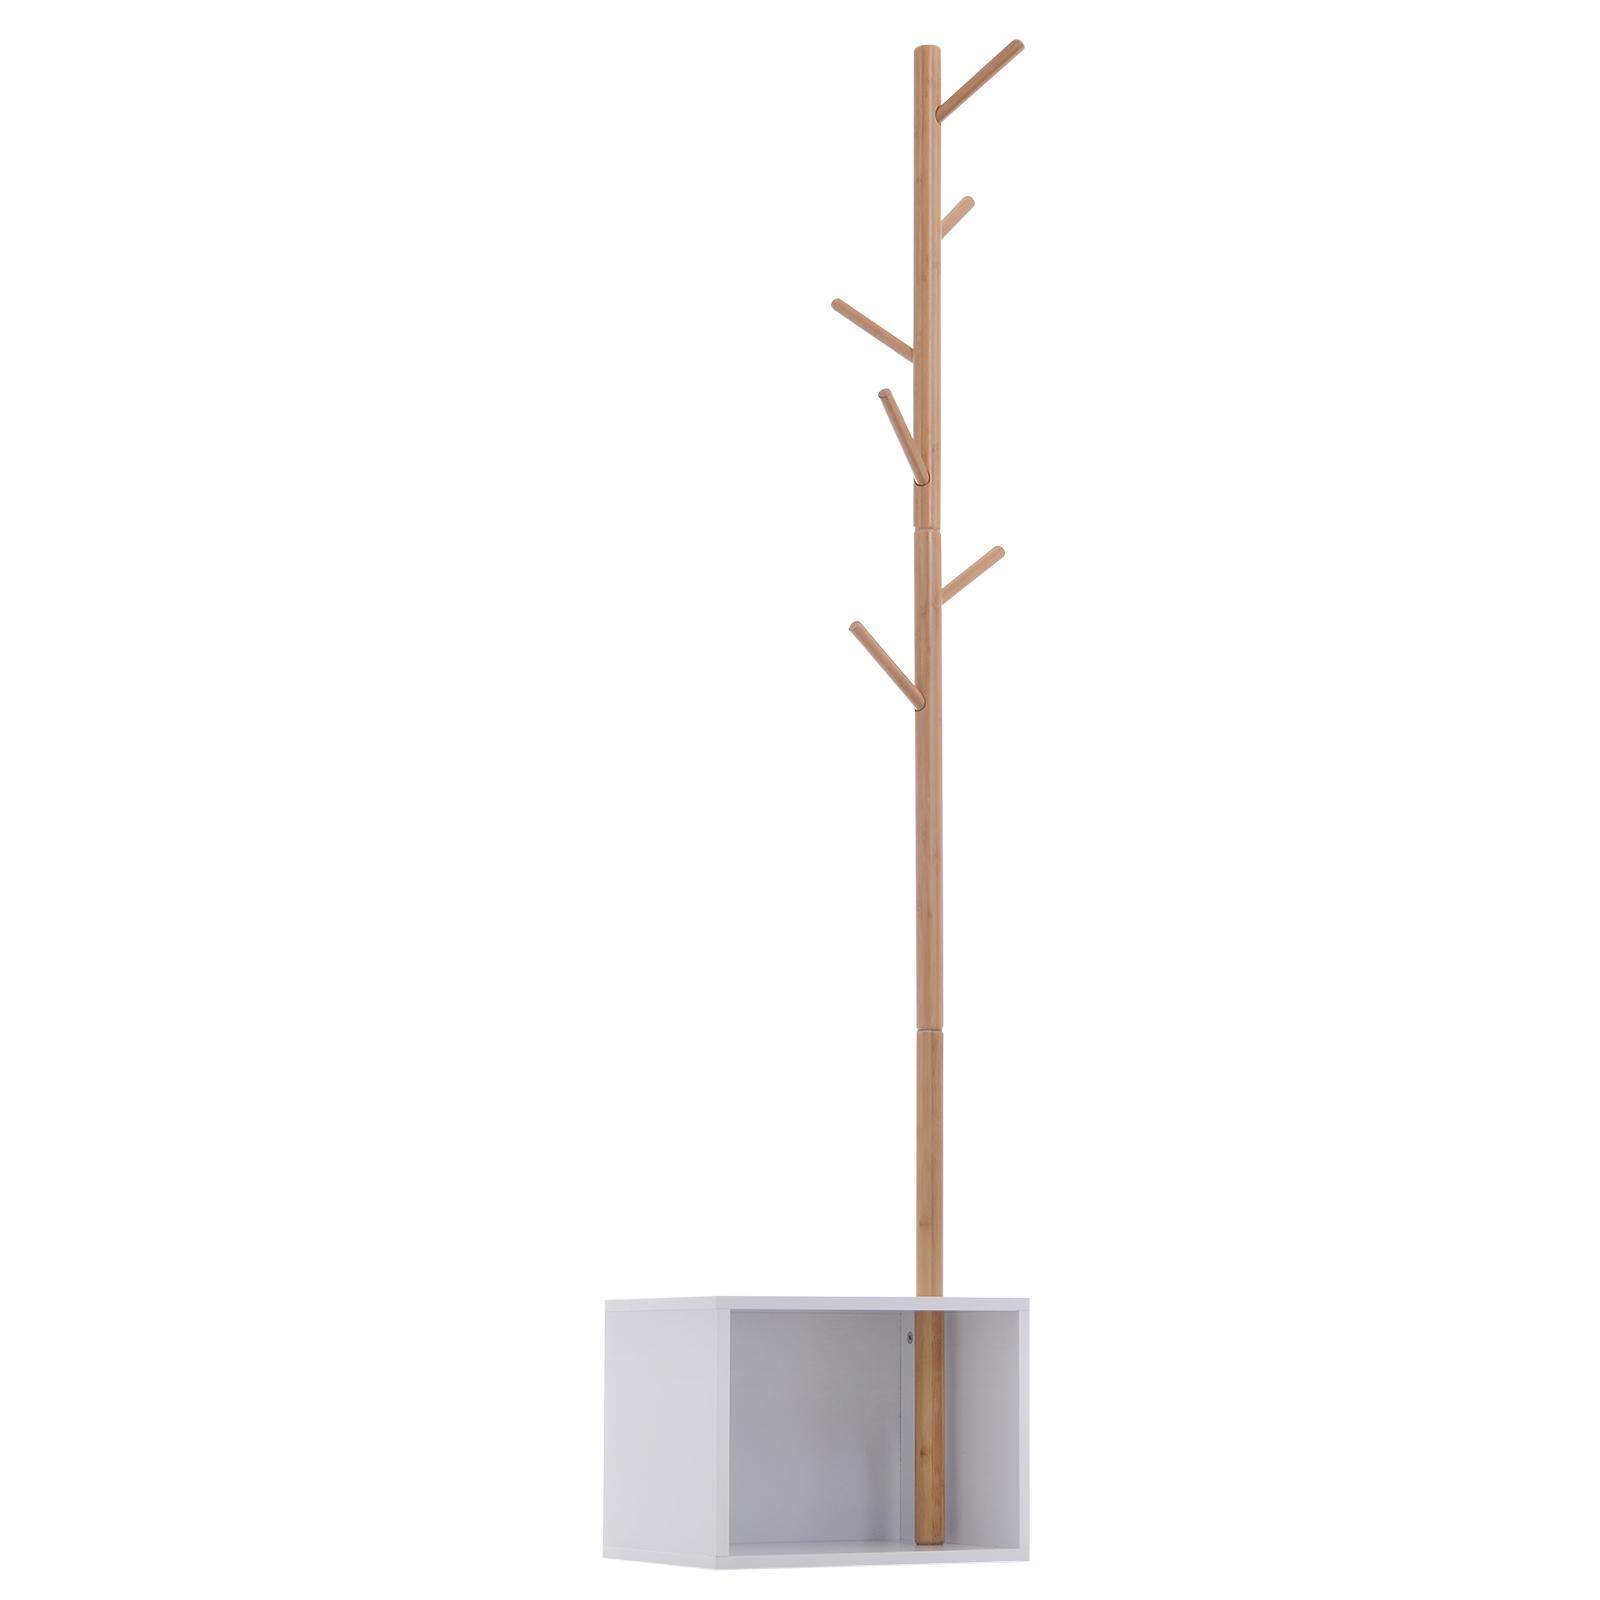 Meuble rangement porte-manteaux 2 en 1 blanc bois bambou